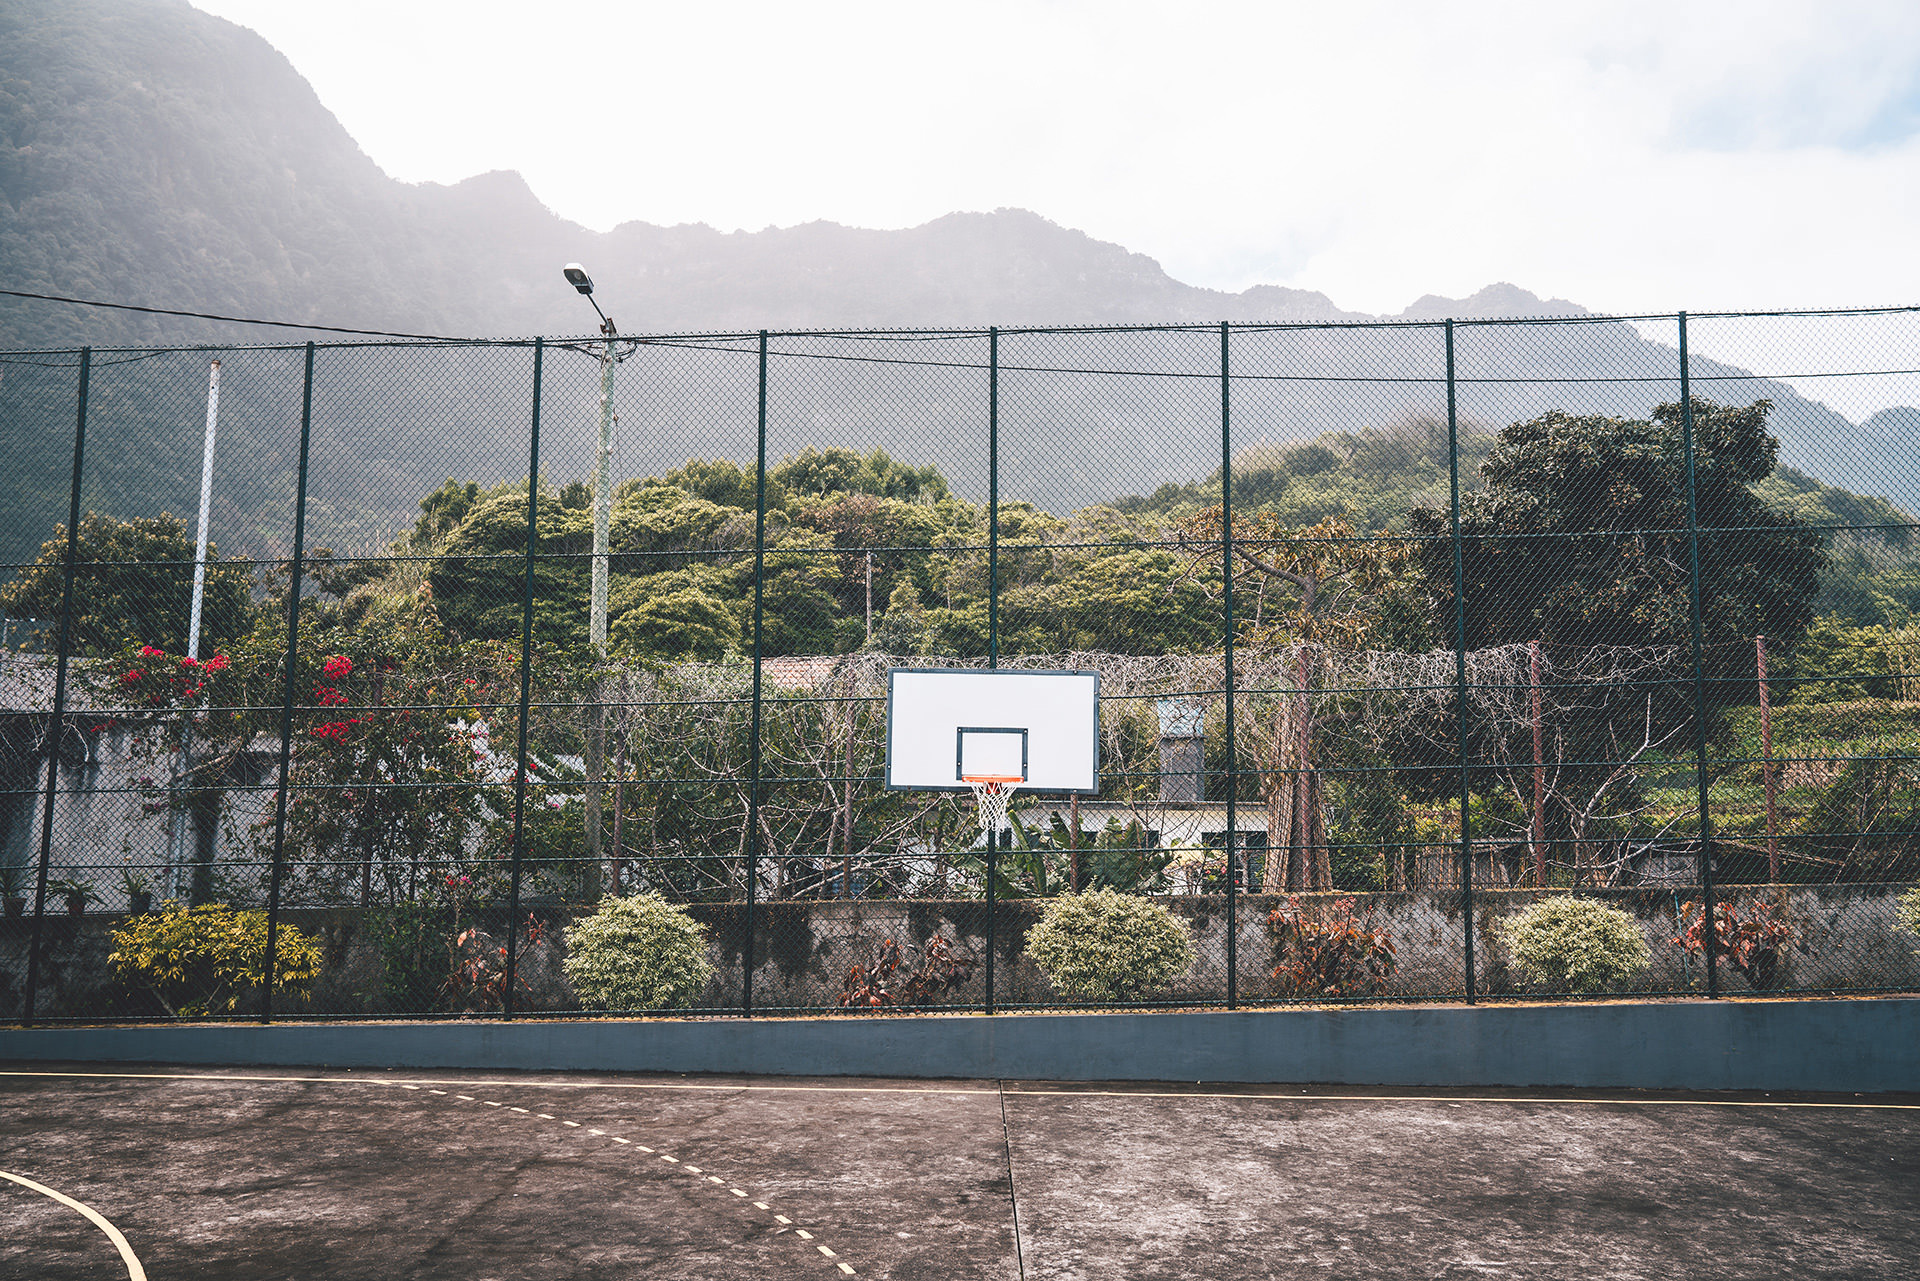 basketball-platz-natur-berge